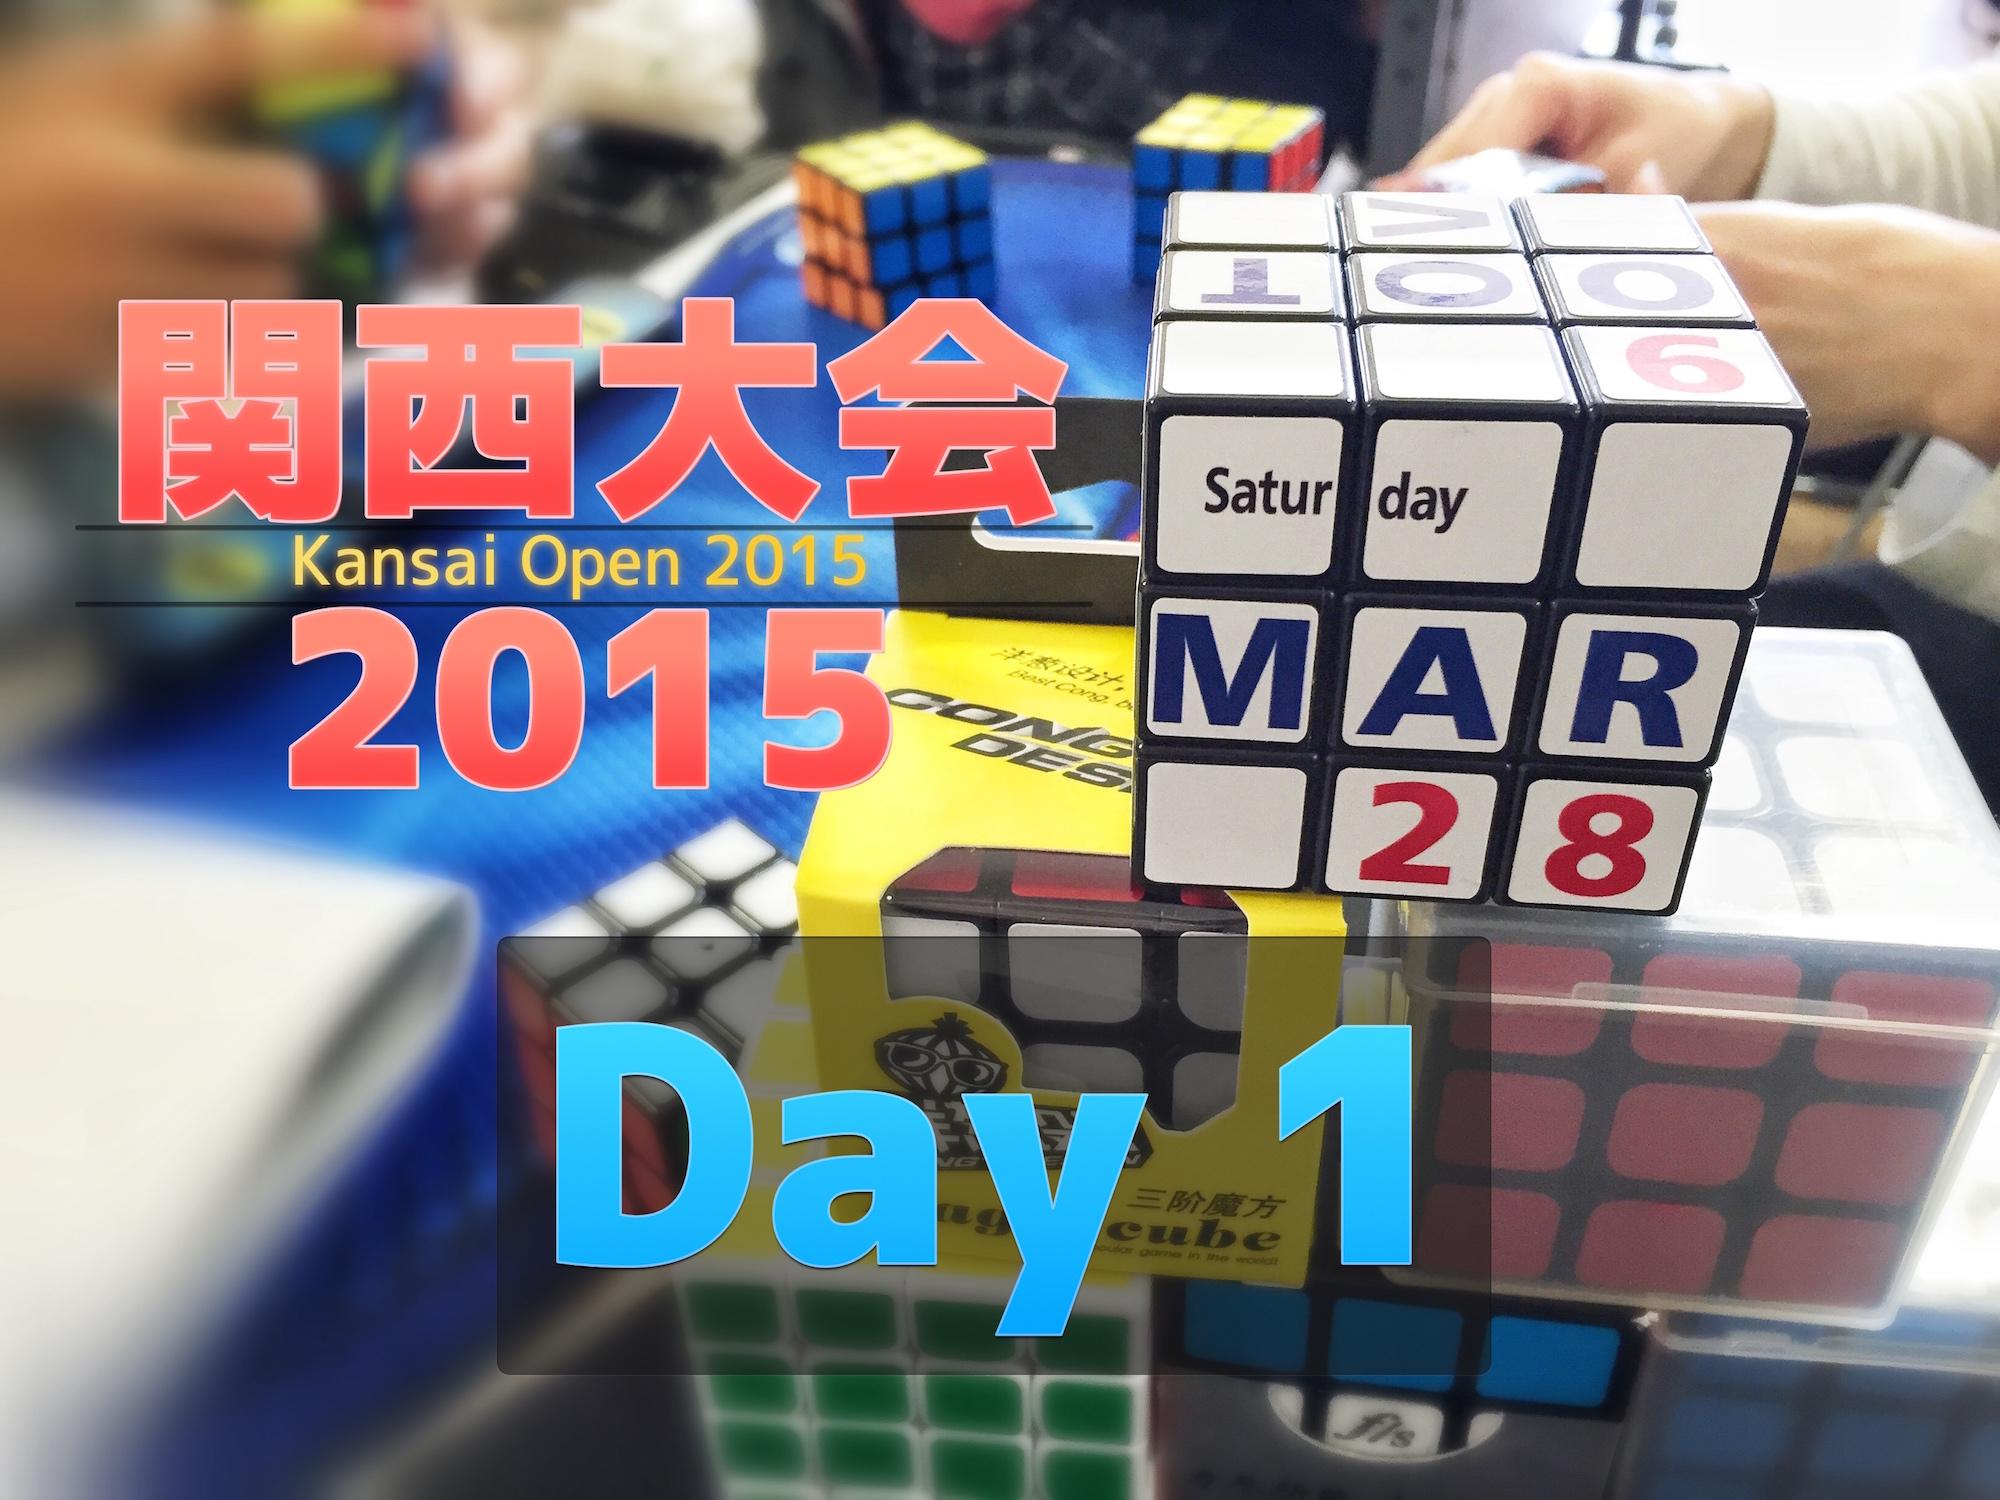 関西大会 2015 Day 1